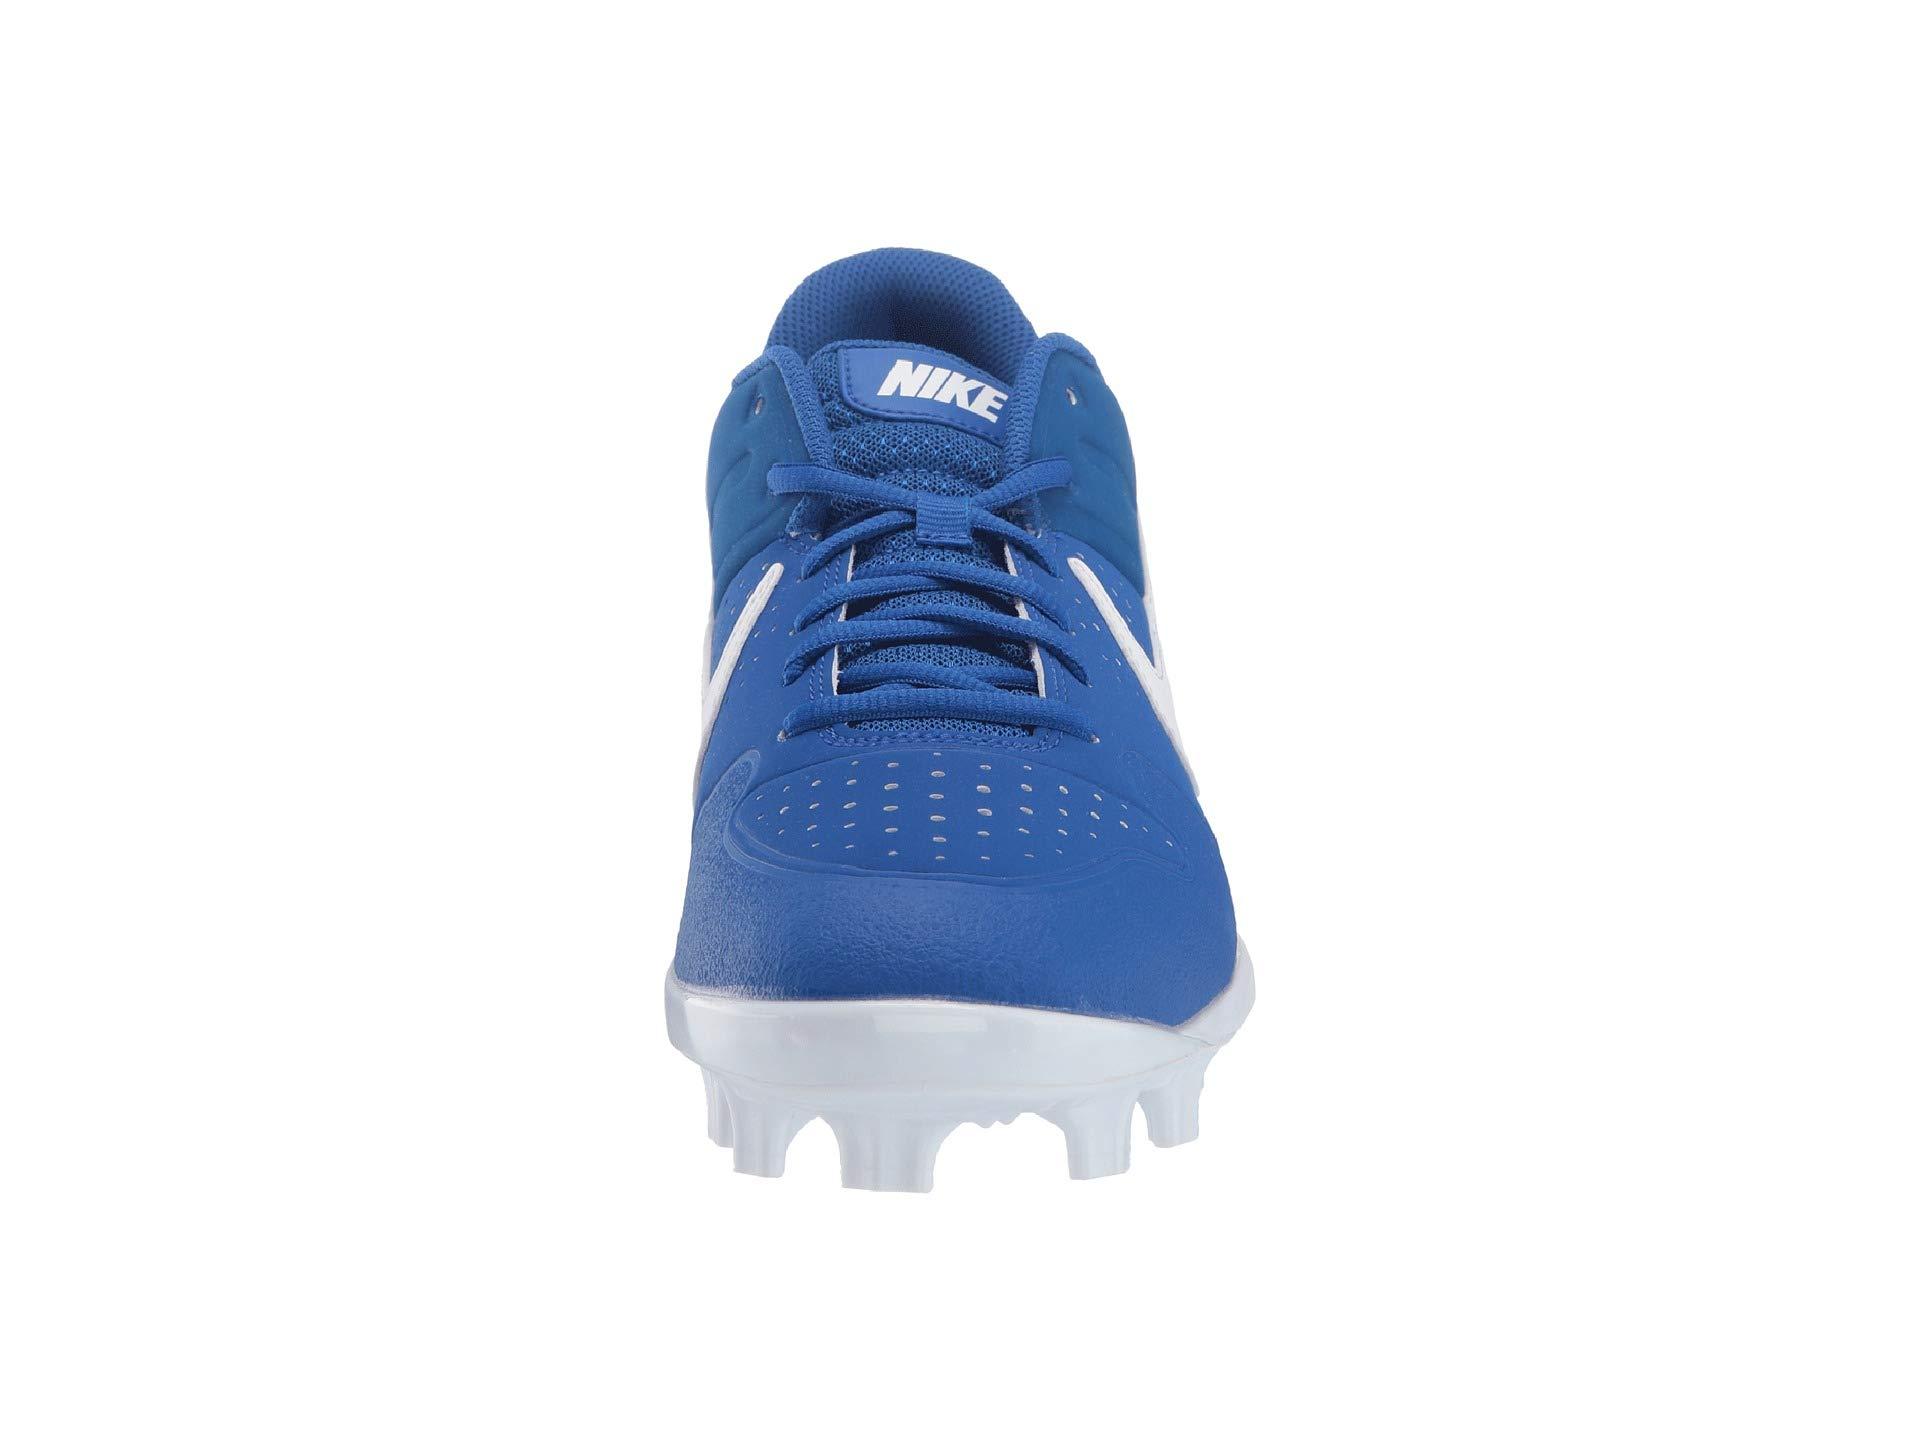 Blue Nike Mcs Royal Alpha Game Huarache Low Varsity gym white IBBnUOr